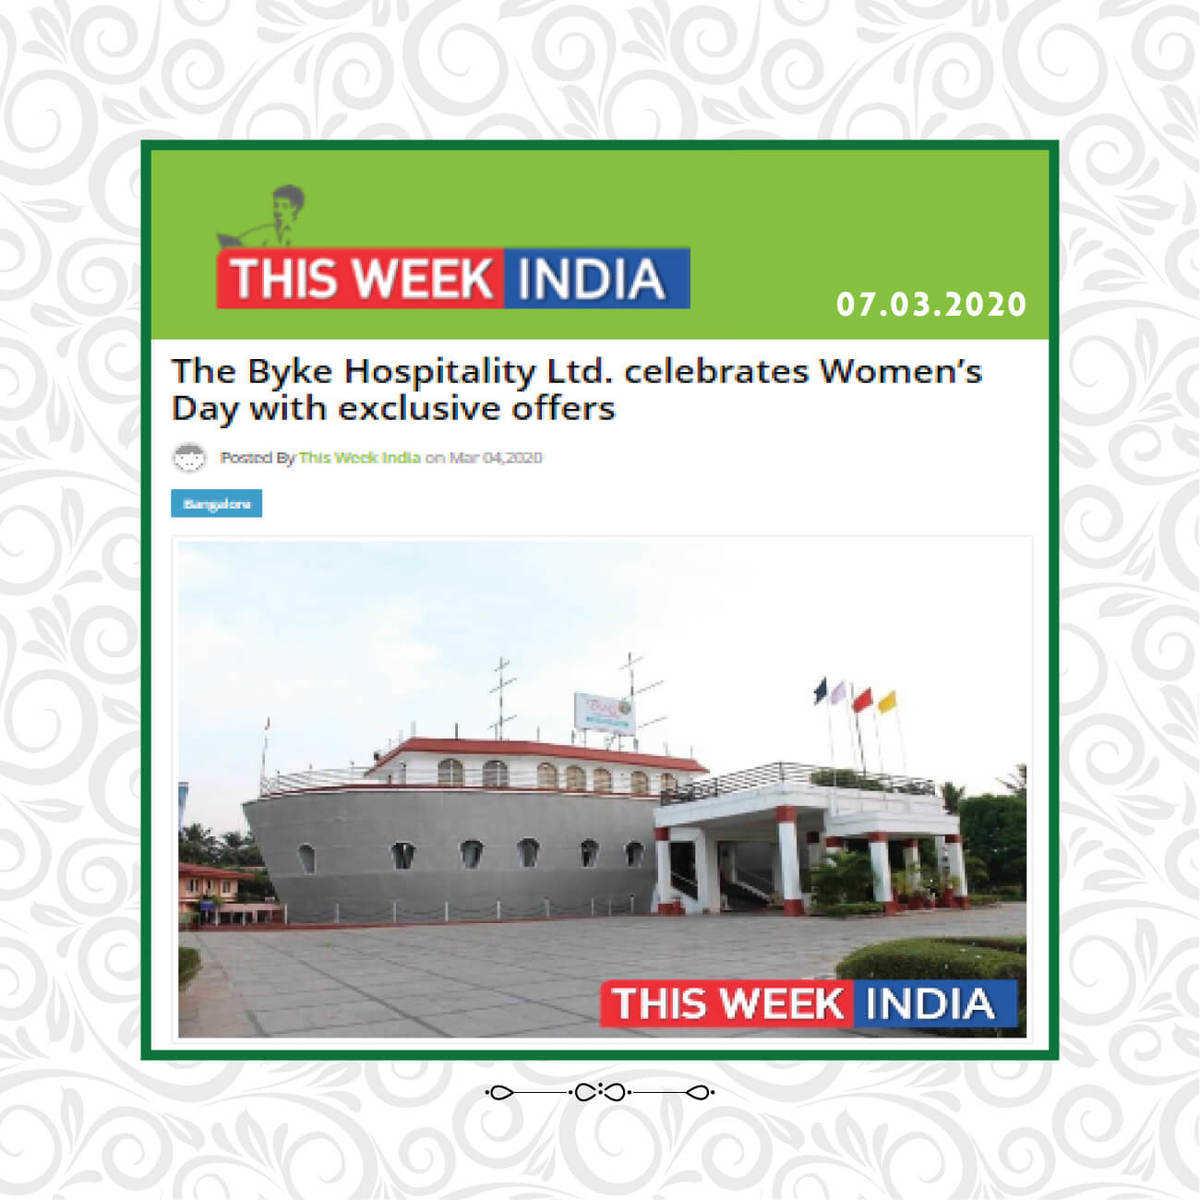 This Week India